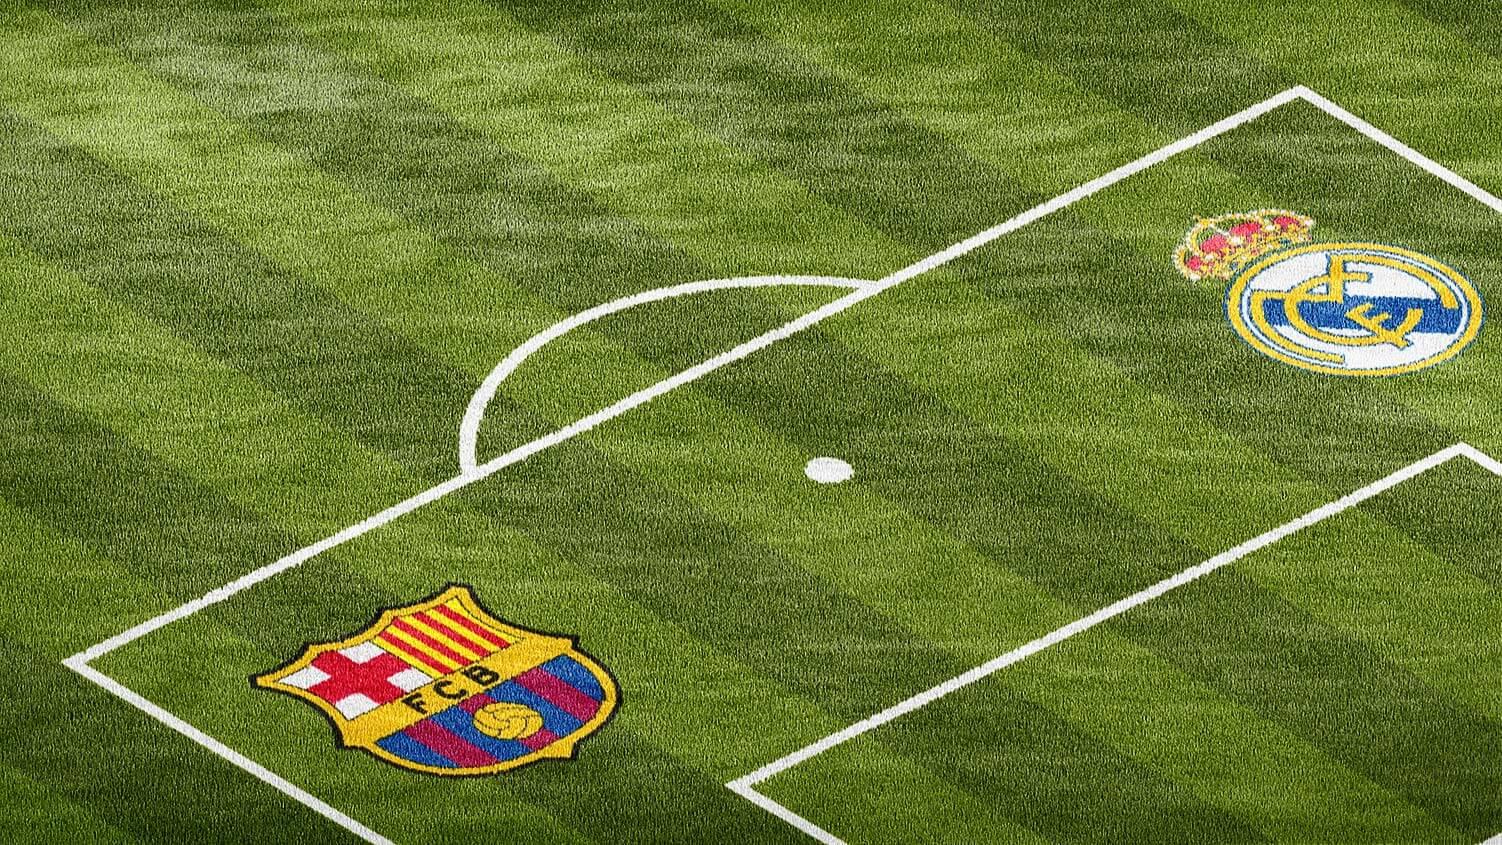 real madrid vs barcelona Football midfield logo photoshop mockup